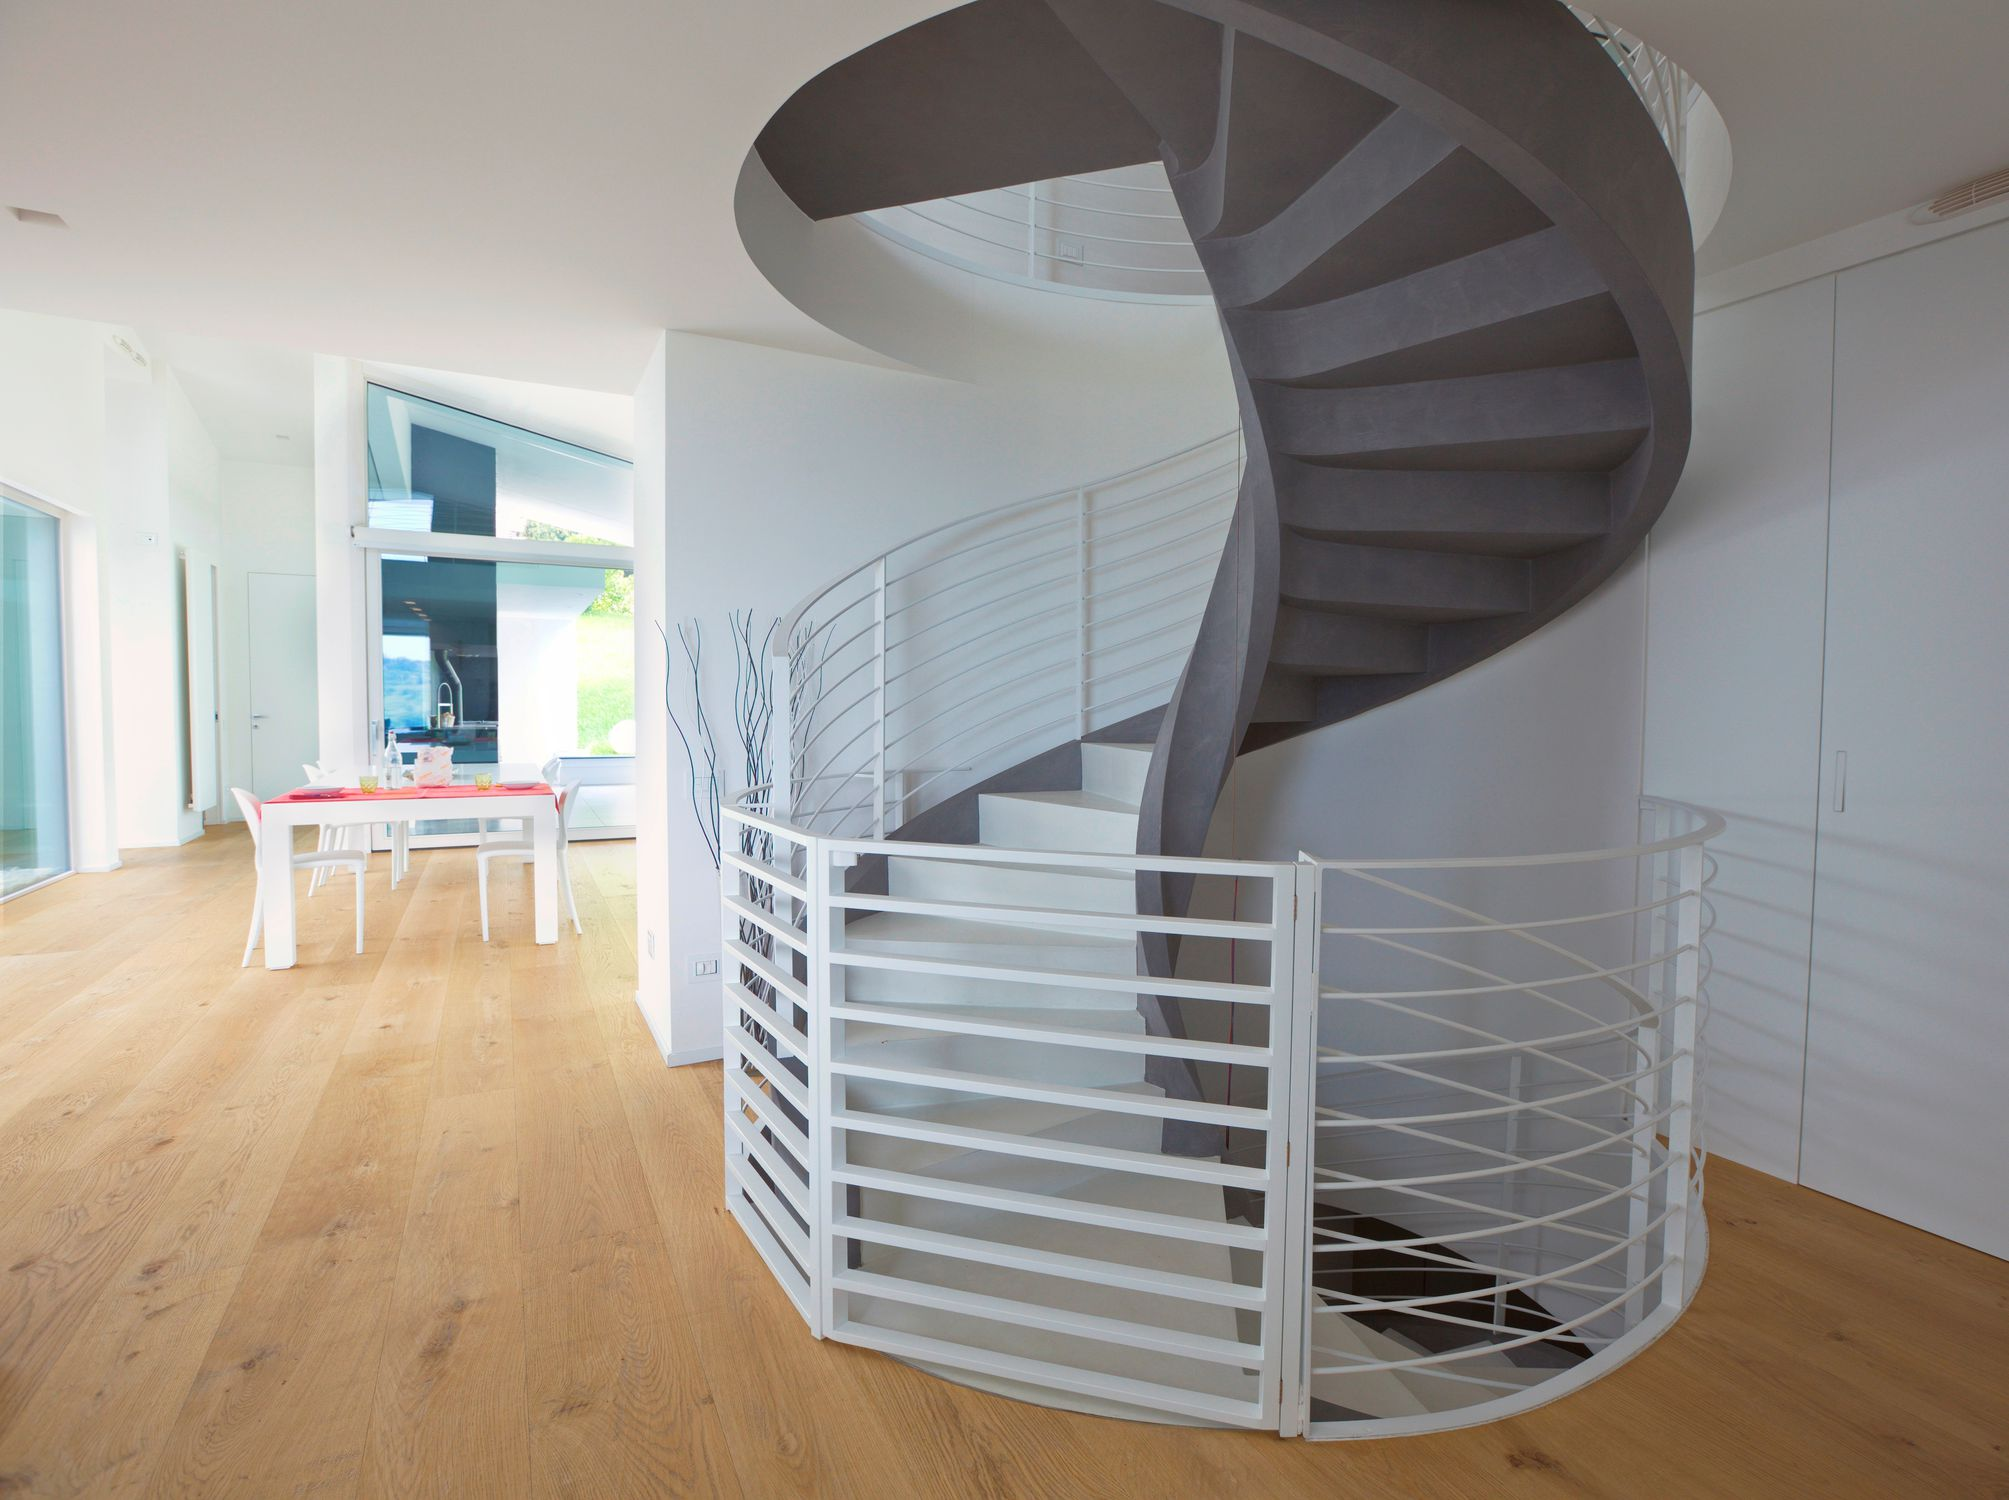 Spindeltreppe / Betonstruktur / Holzstufen / Mit Setzstufe - Eli Ca